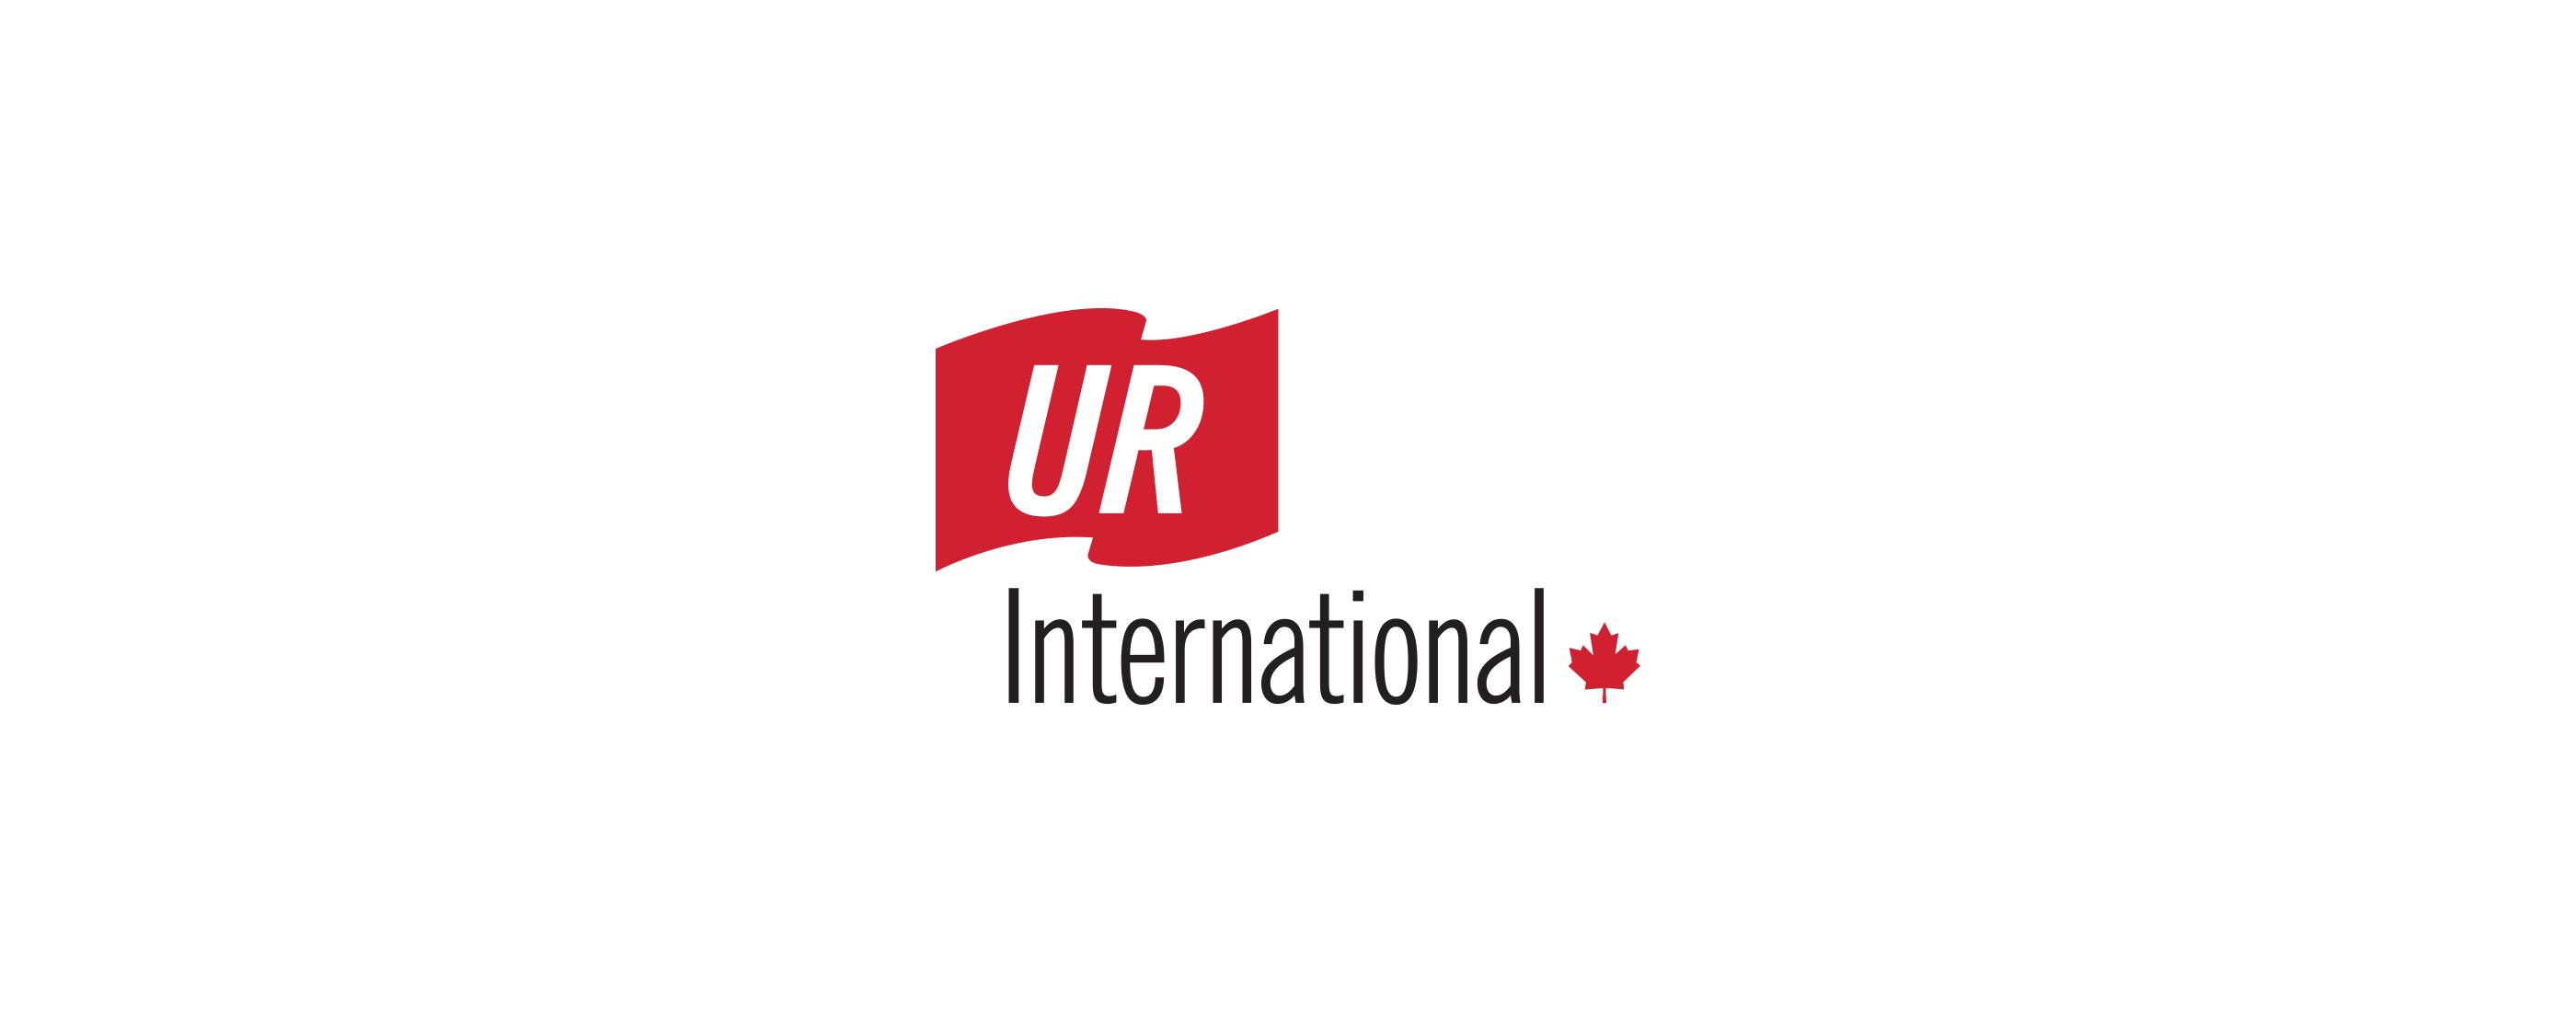 University of Regina International - Logo